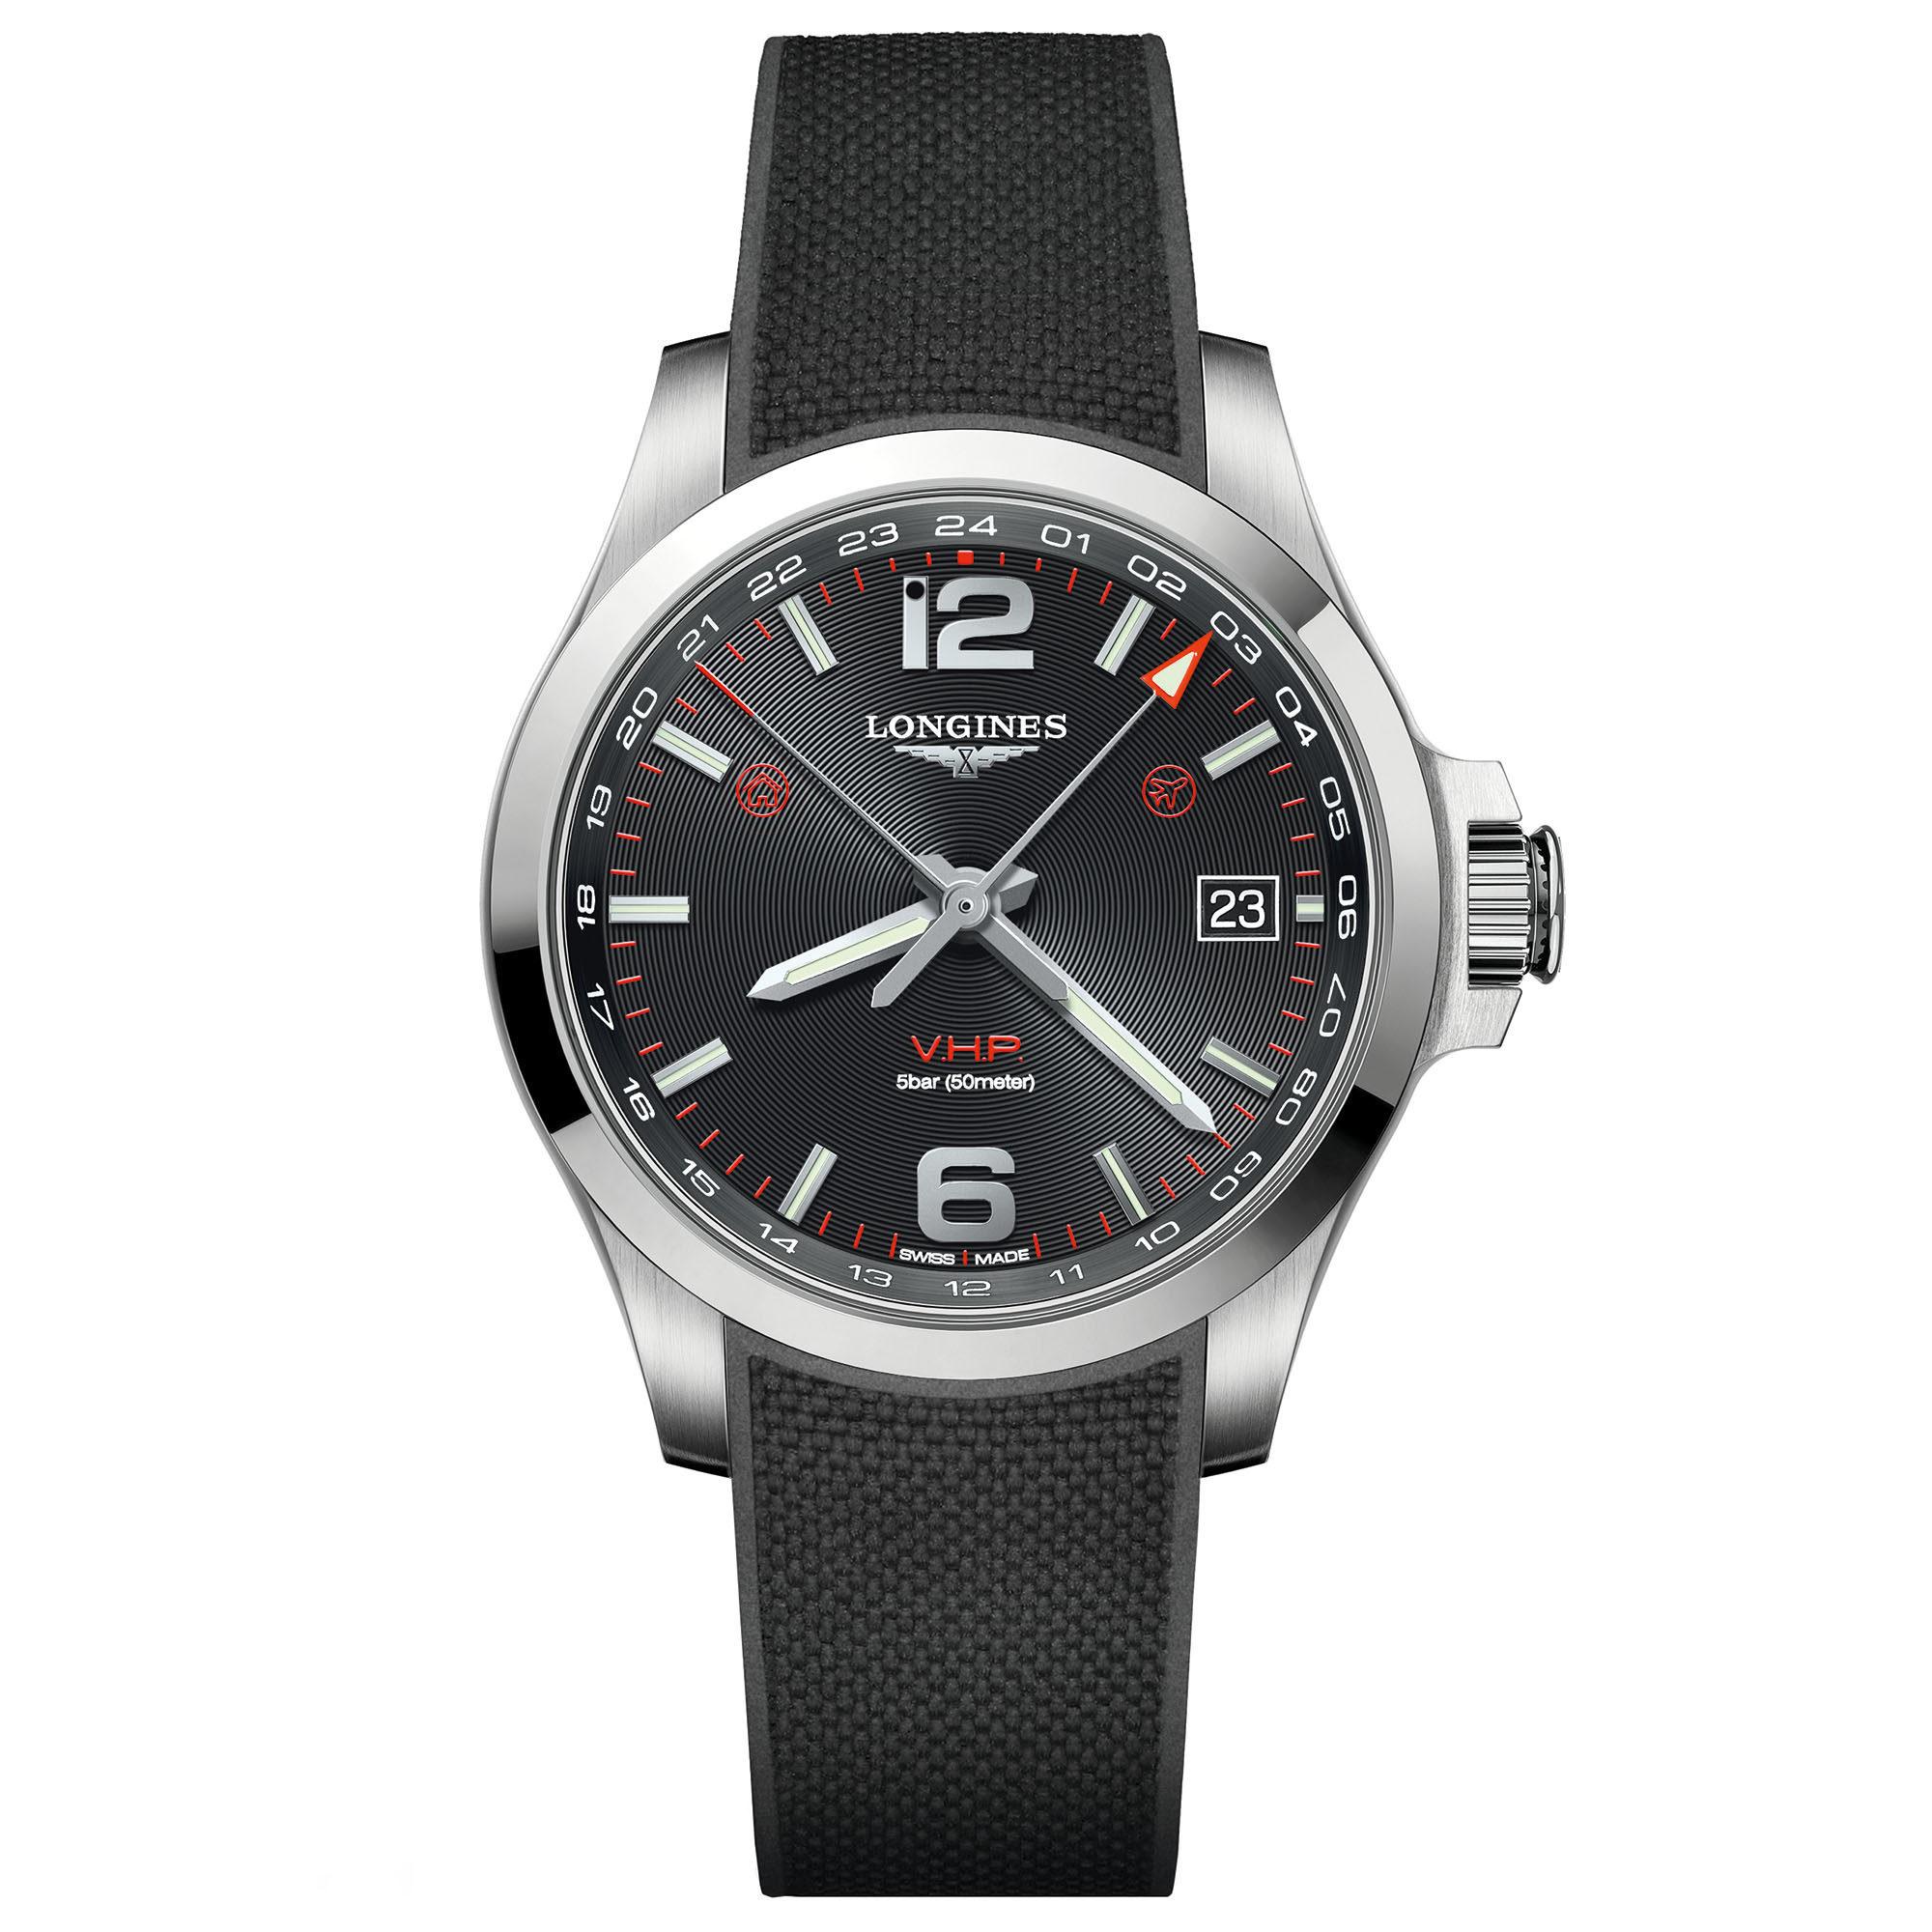 9ab0b55c92c Conquest V.H.P. GMT Flash Setting. L3.718.4.56.9. Find an official retailer  · l3.718.4.56.9 face